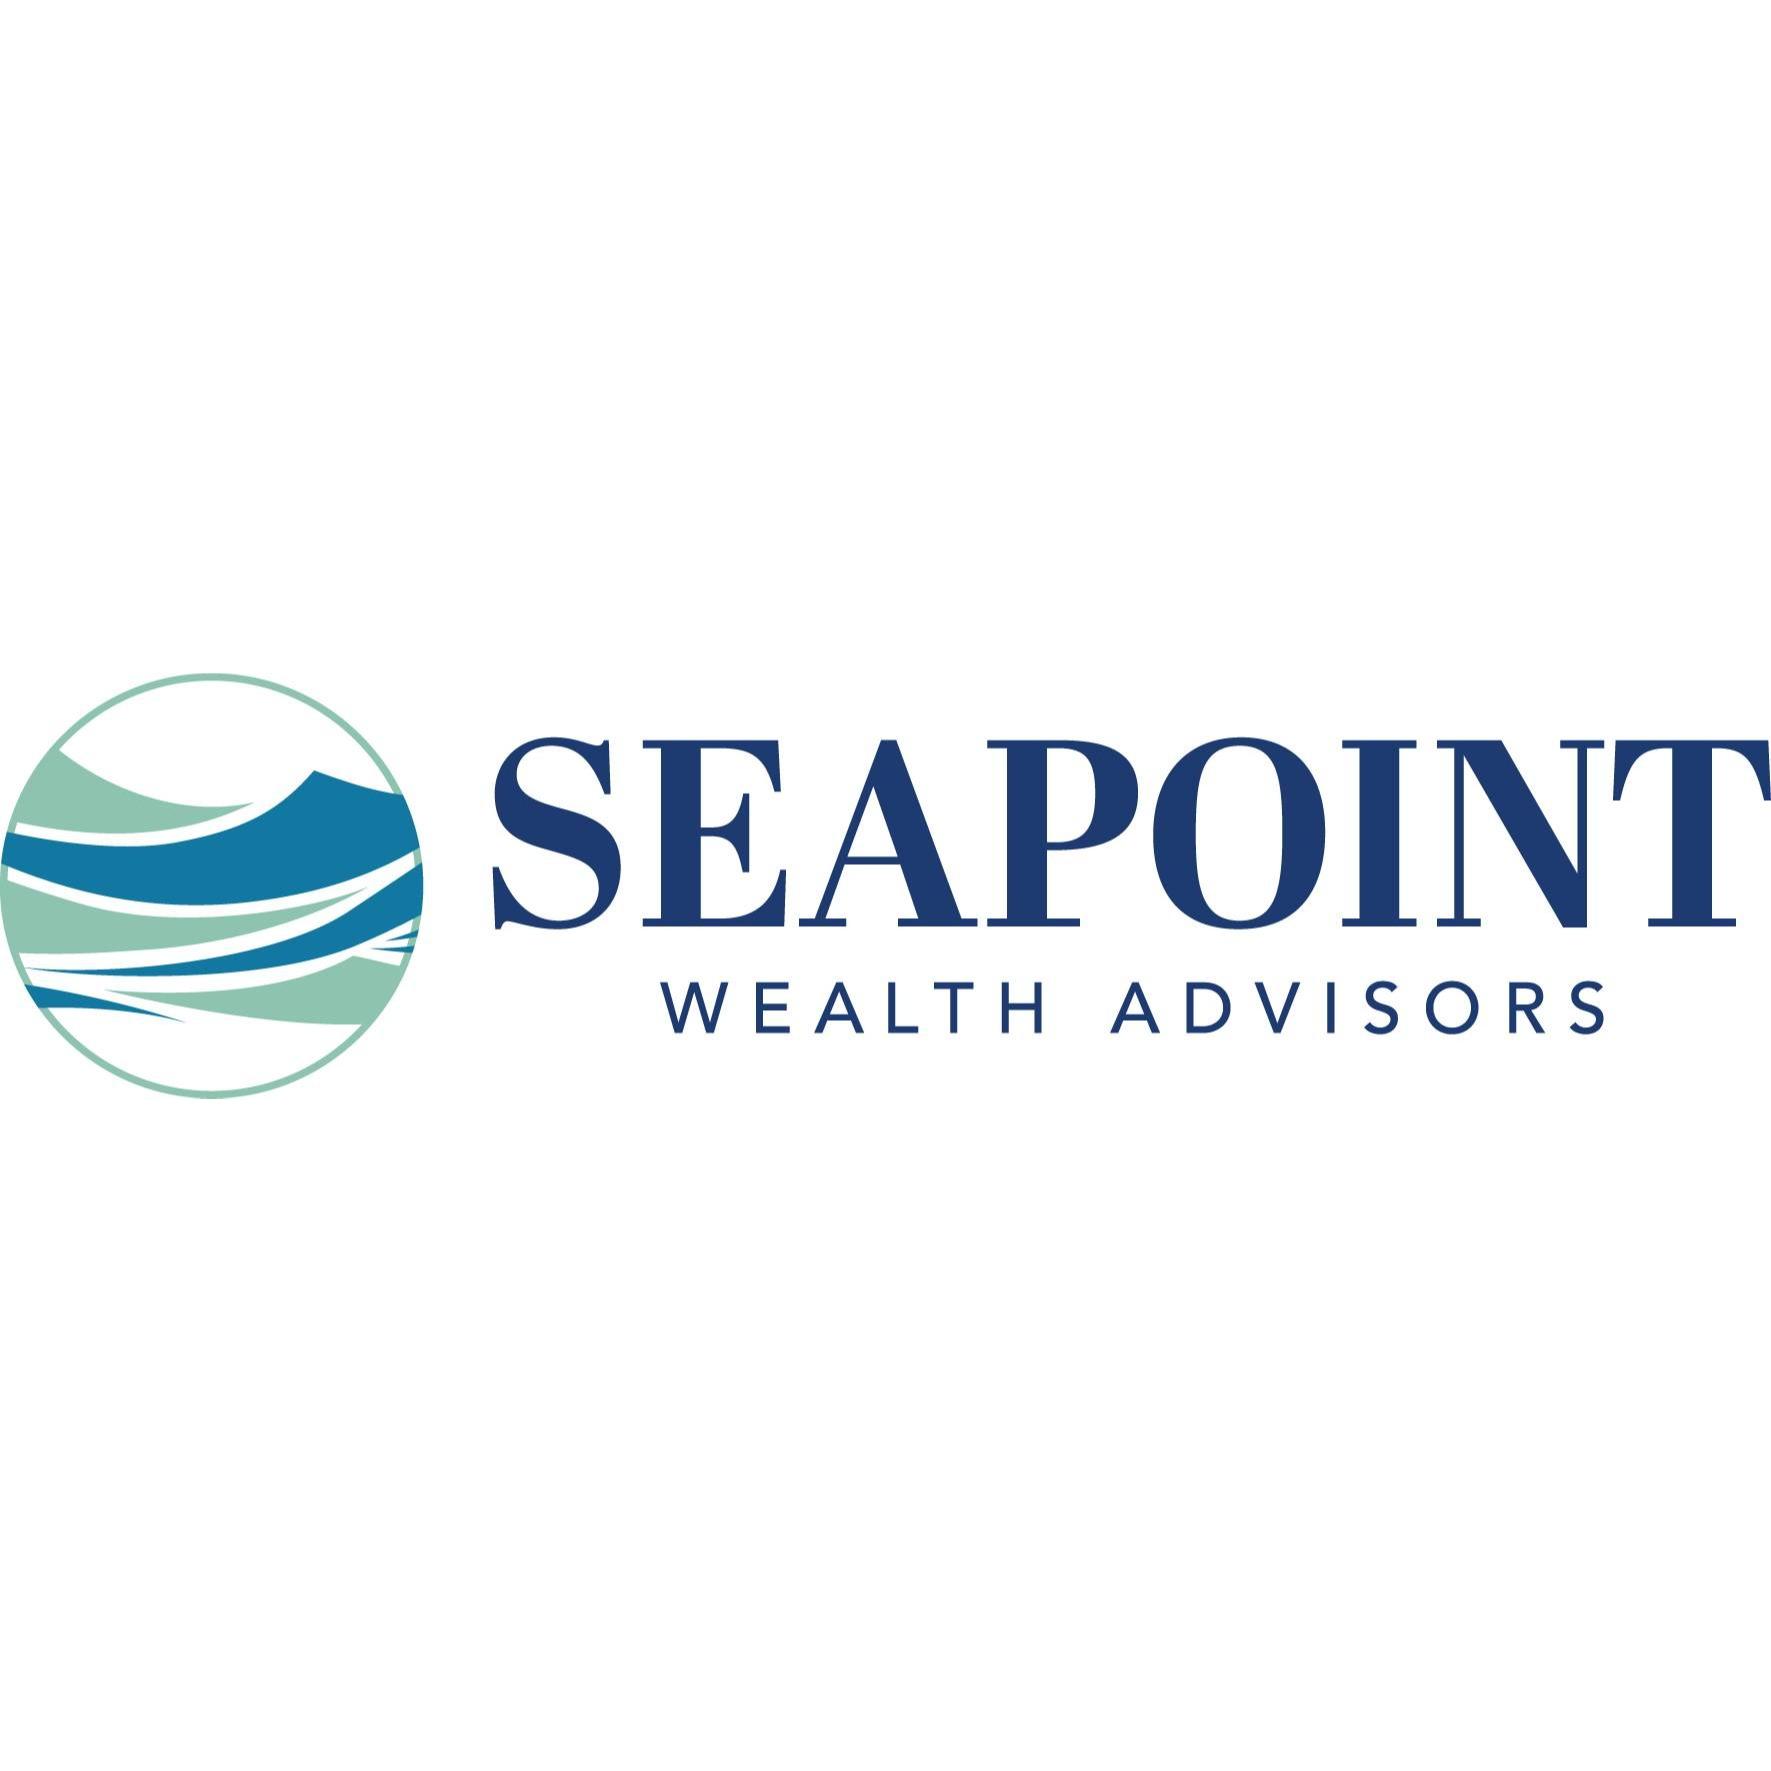 Seapoint Wealth Advisors